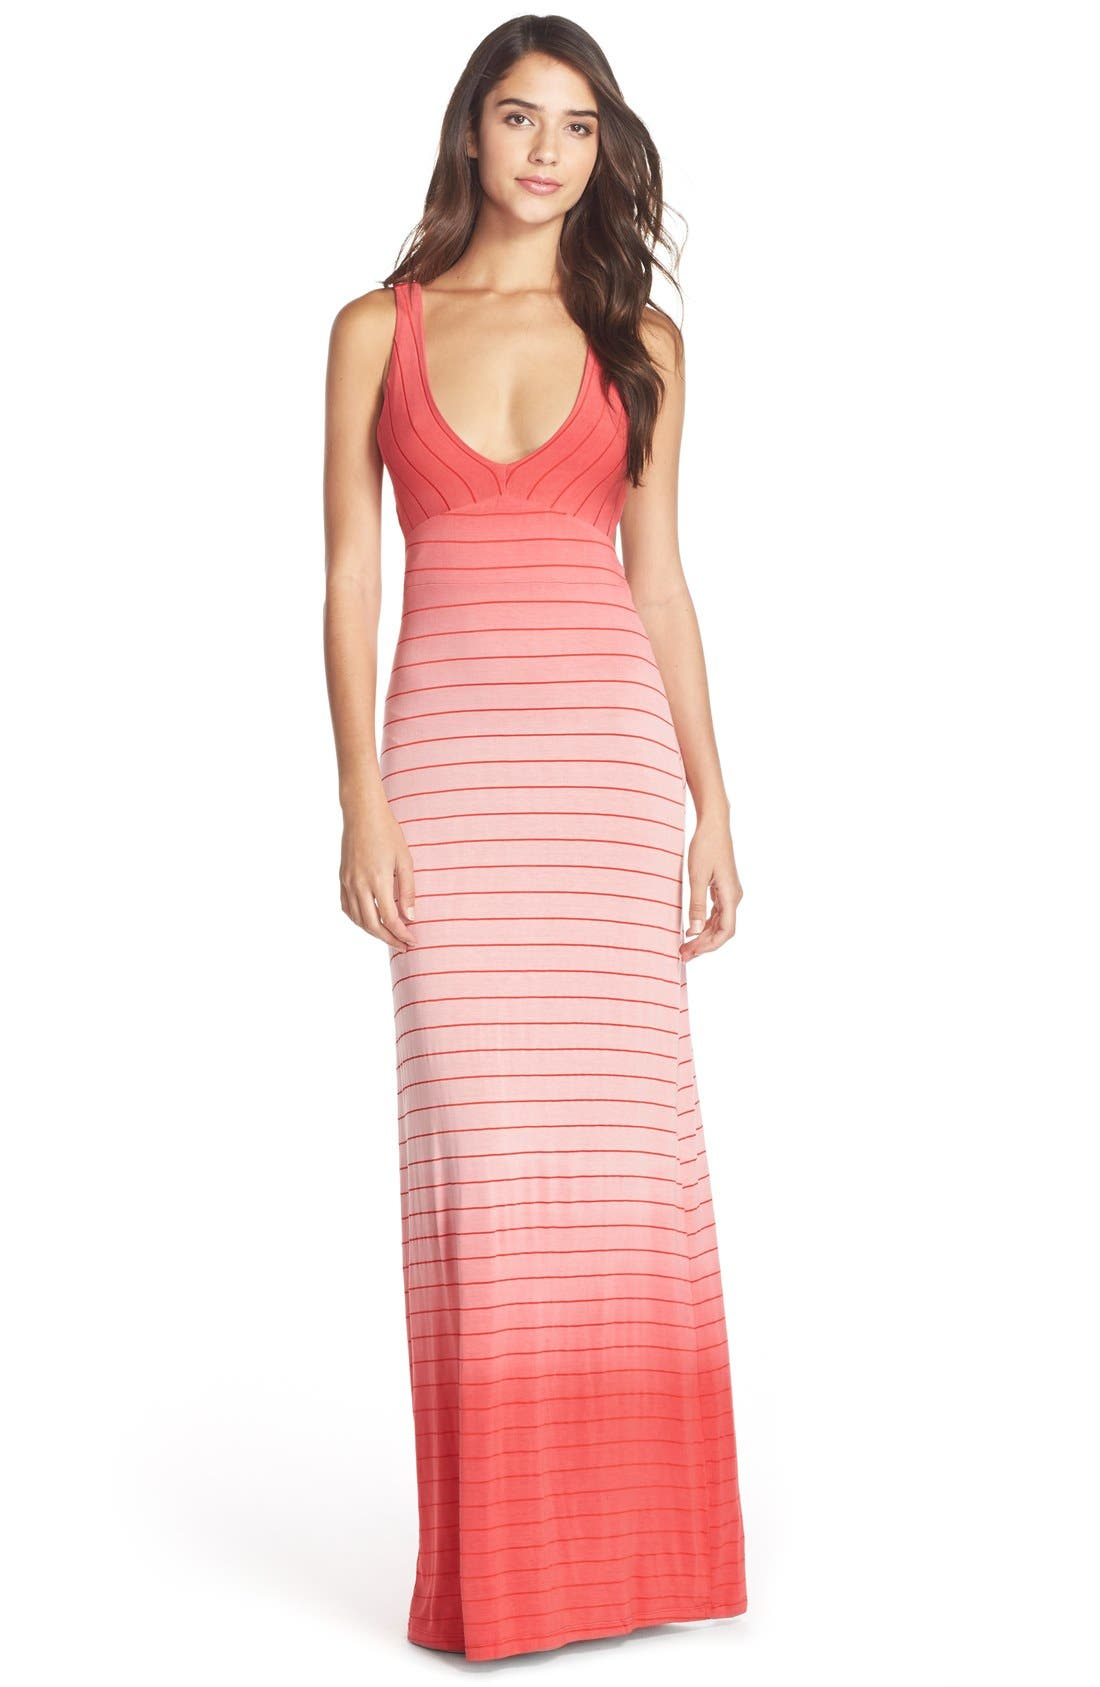 Alternate Image 1 Selected - Fraiche by J Ombré Tie Dye Jersey Maxi Dress